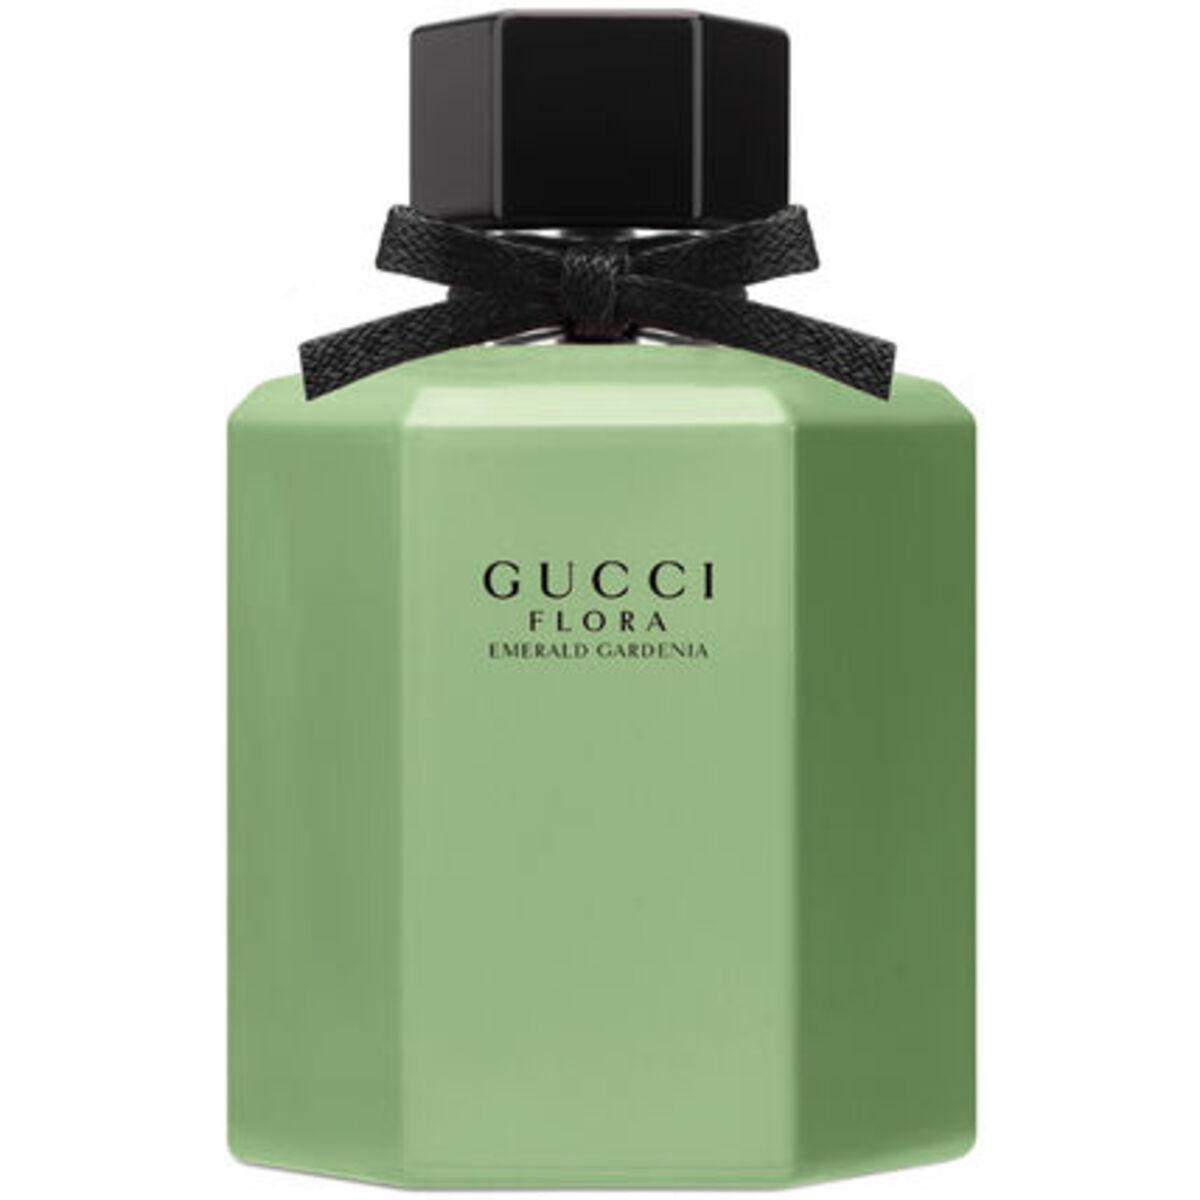 Bild 1 von Gucci Flora Emerald Gardenia, Eau de Toilette